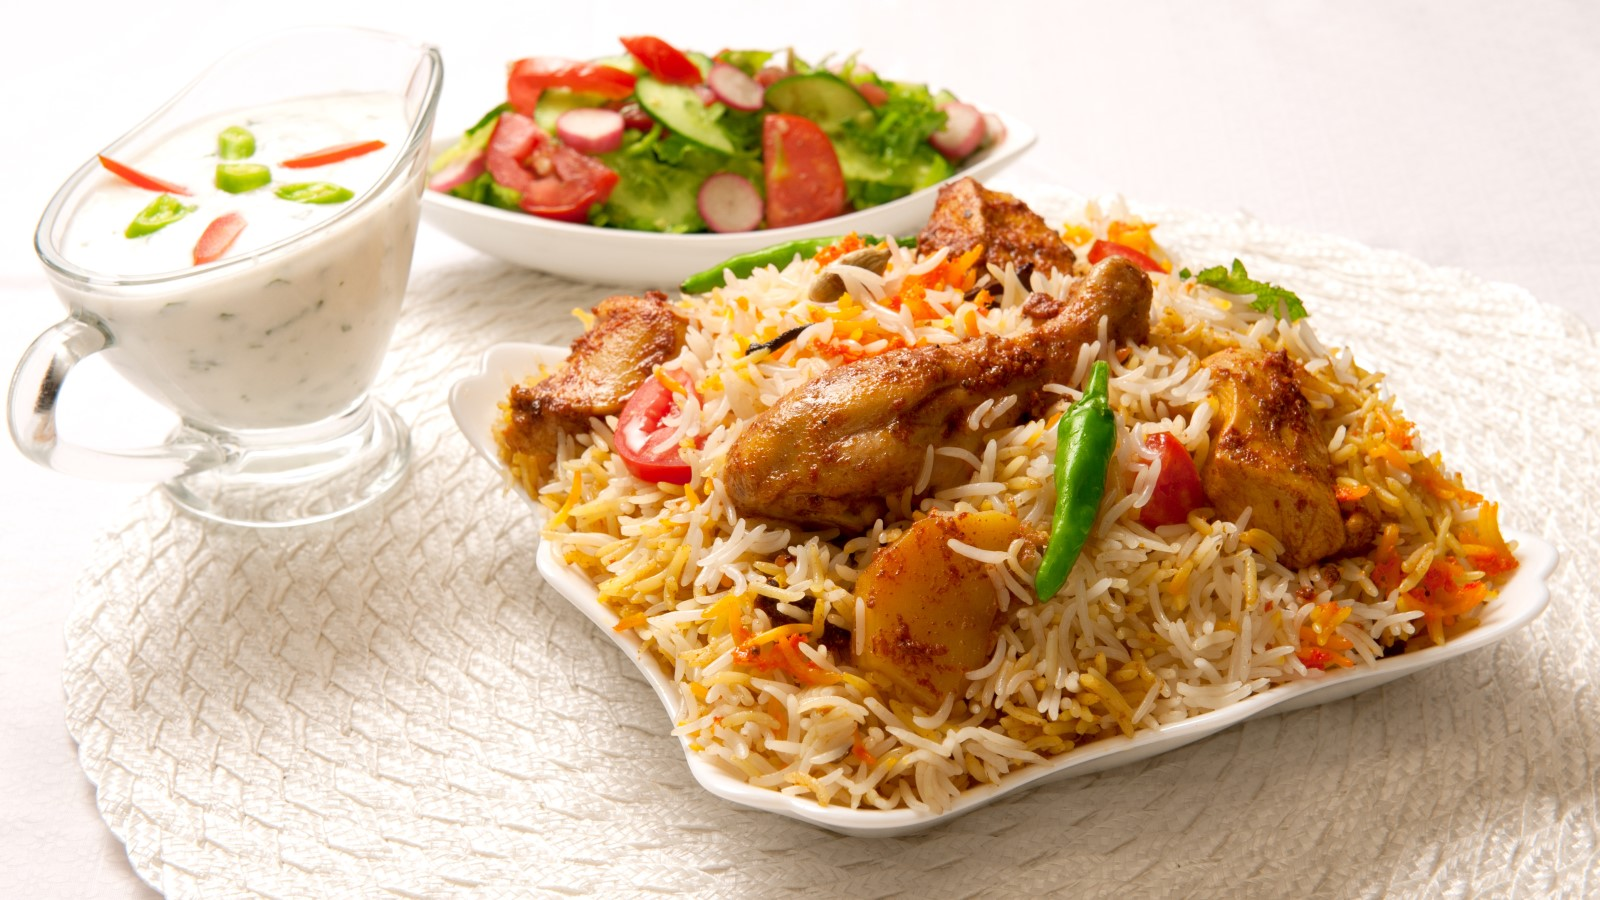 Food served at Ruchi Restaurant